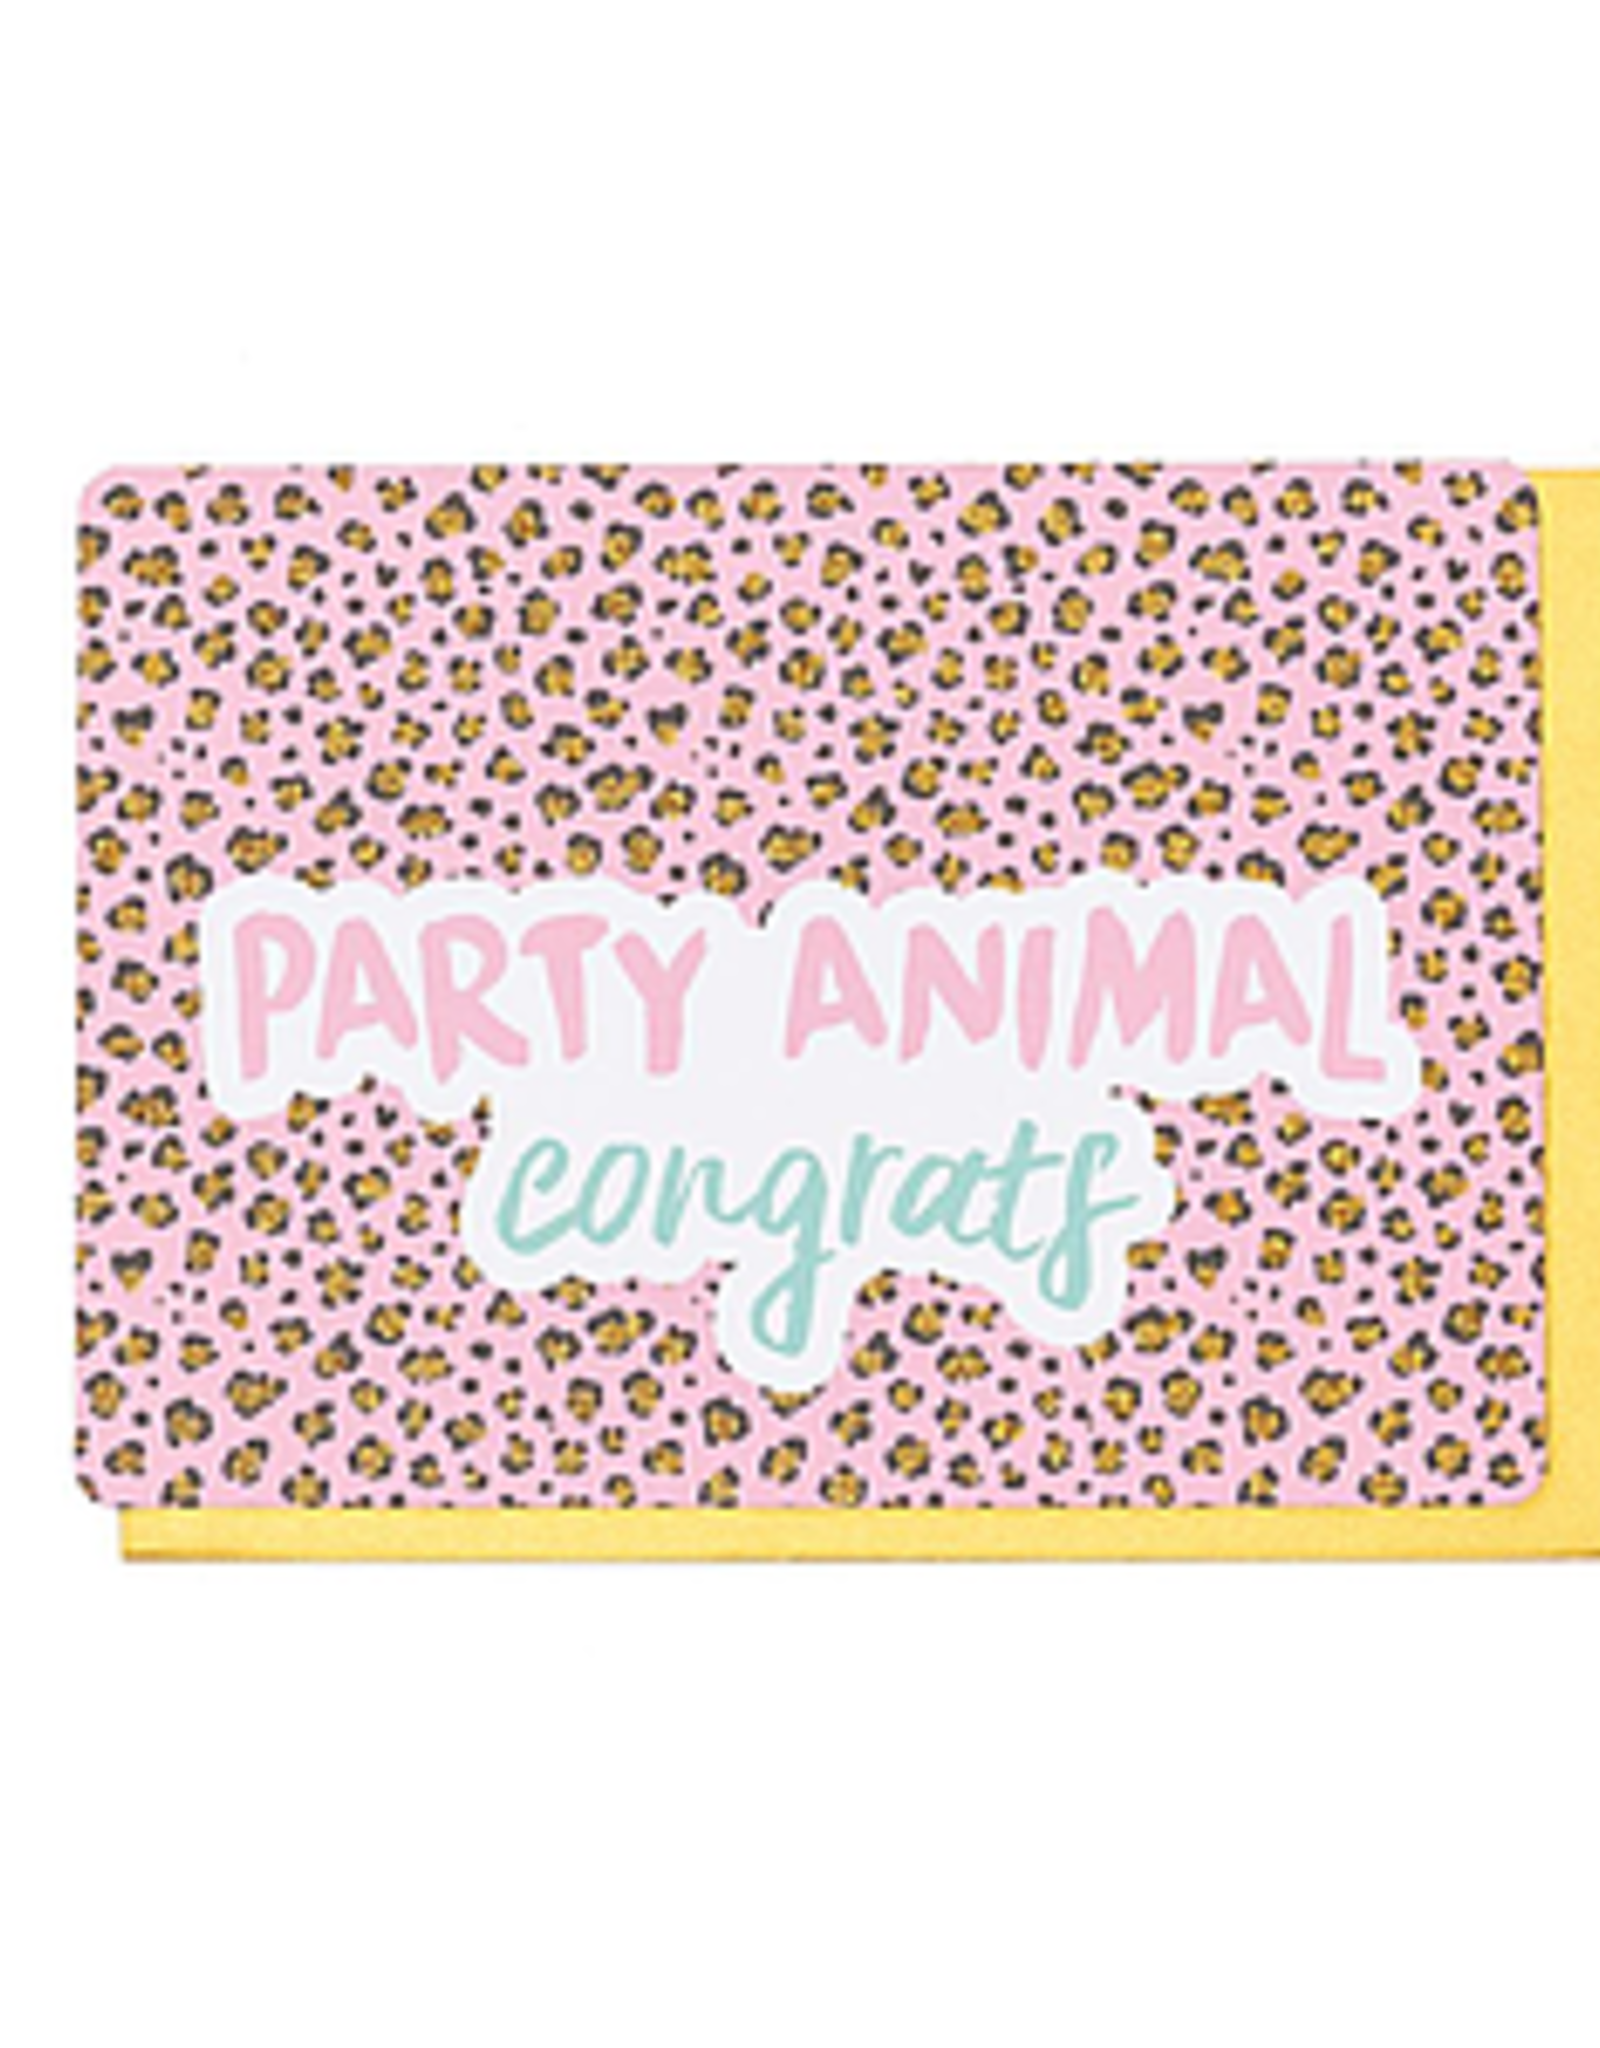 Enfant Terrible Dubbele wenskaart Enfant terrible: party animal congrats